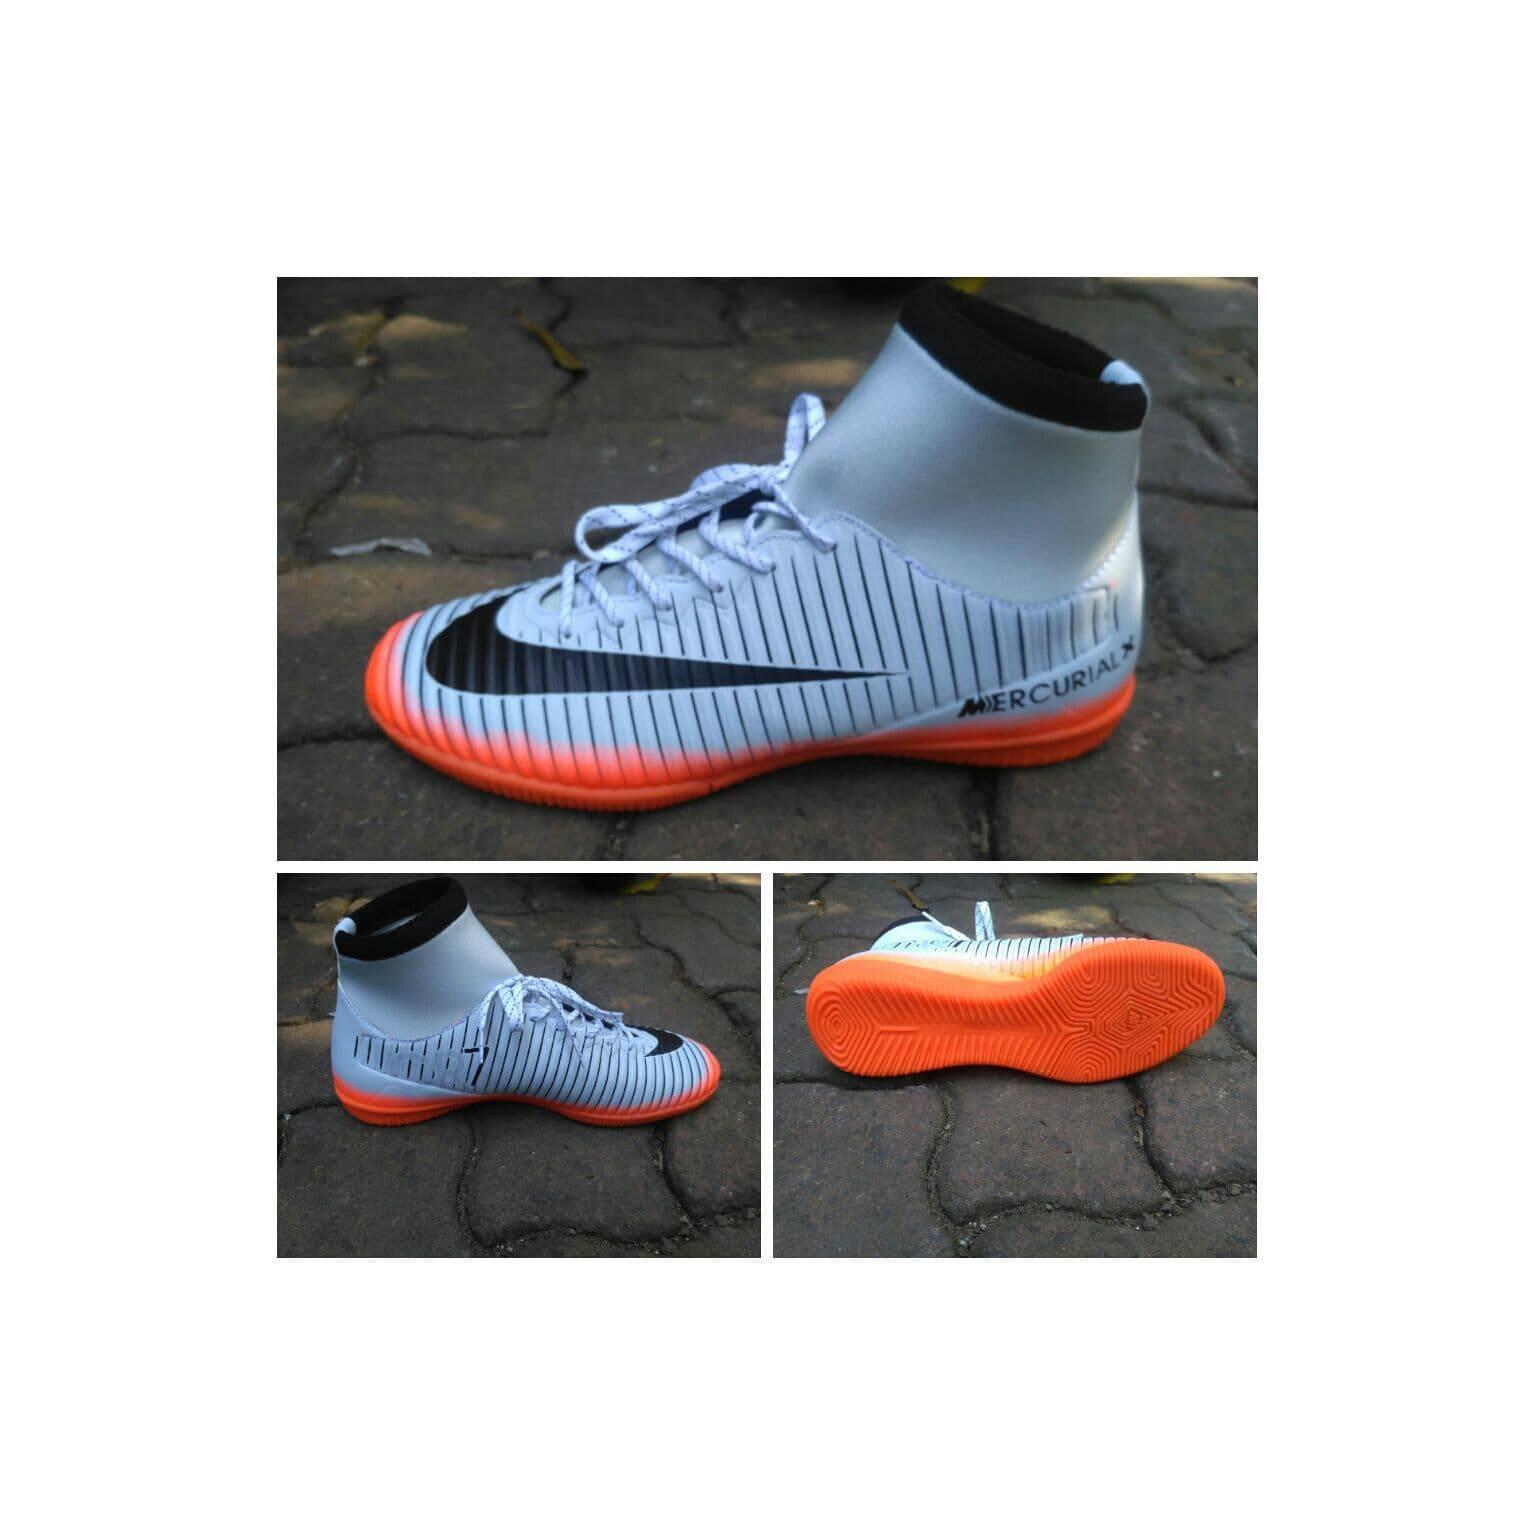 Sepatu futsal nike mercurial x putih kombinasi orange superfly